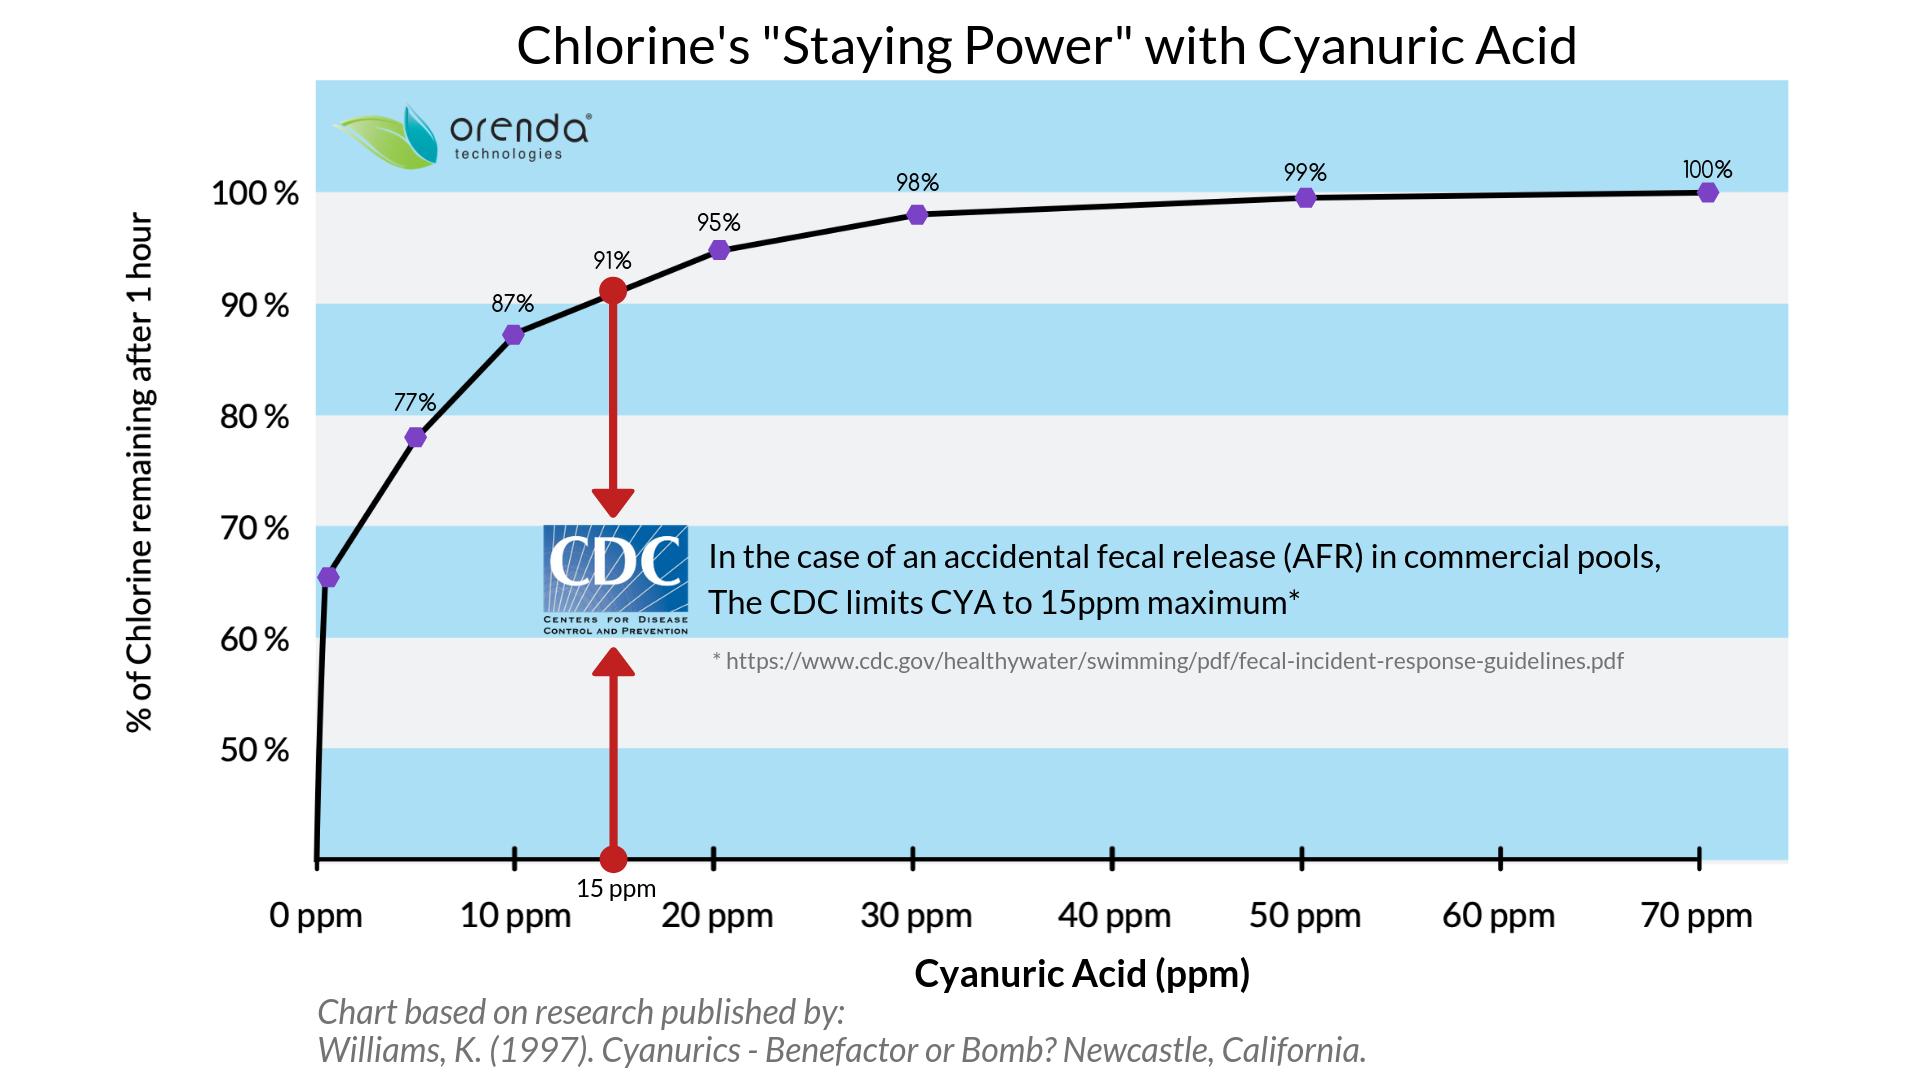 Chlorine Staying Power, CYA, overstabilization, Orenda, cyanuric acid